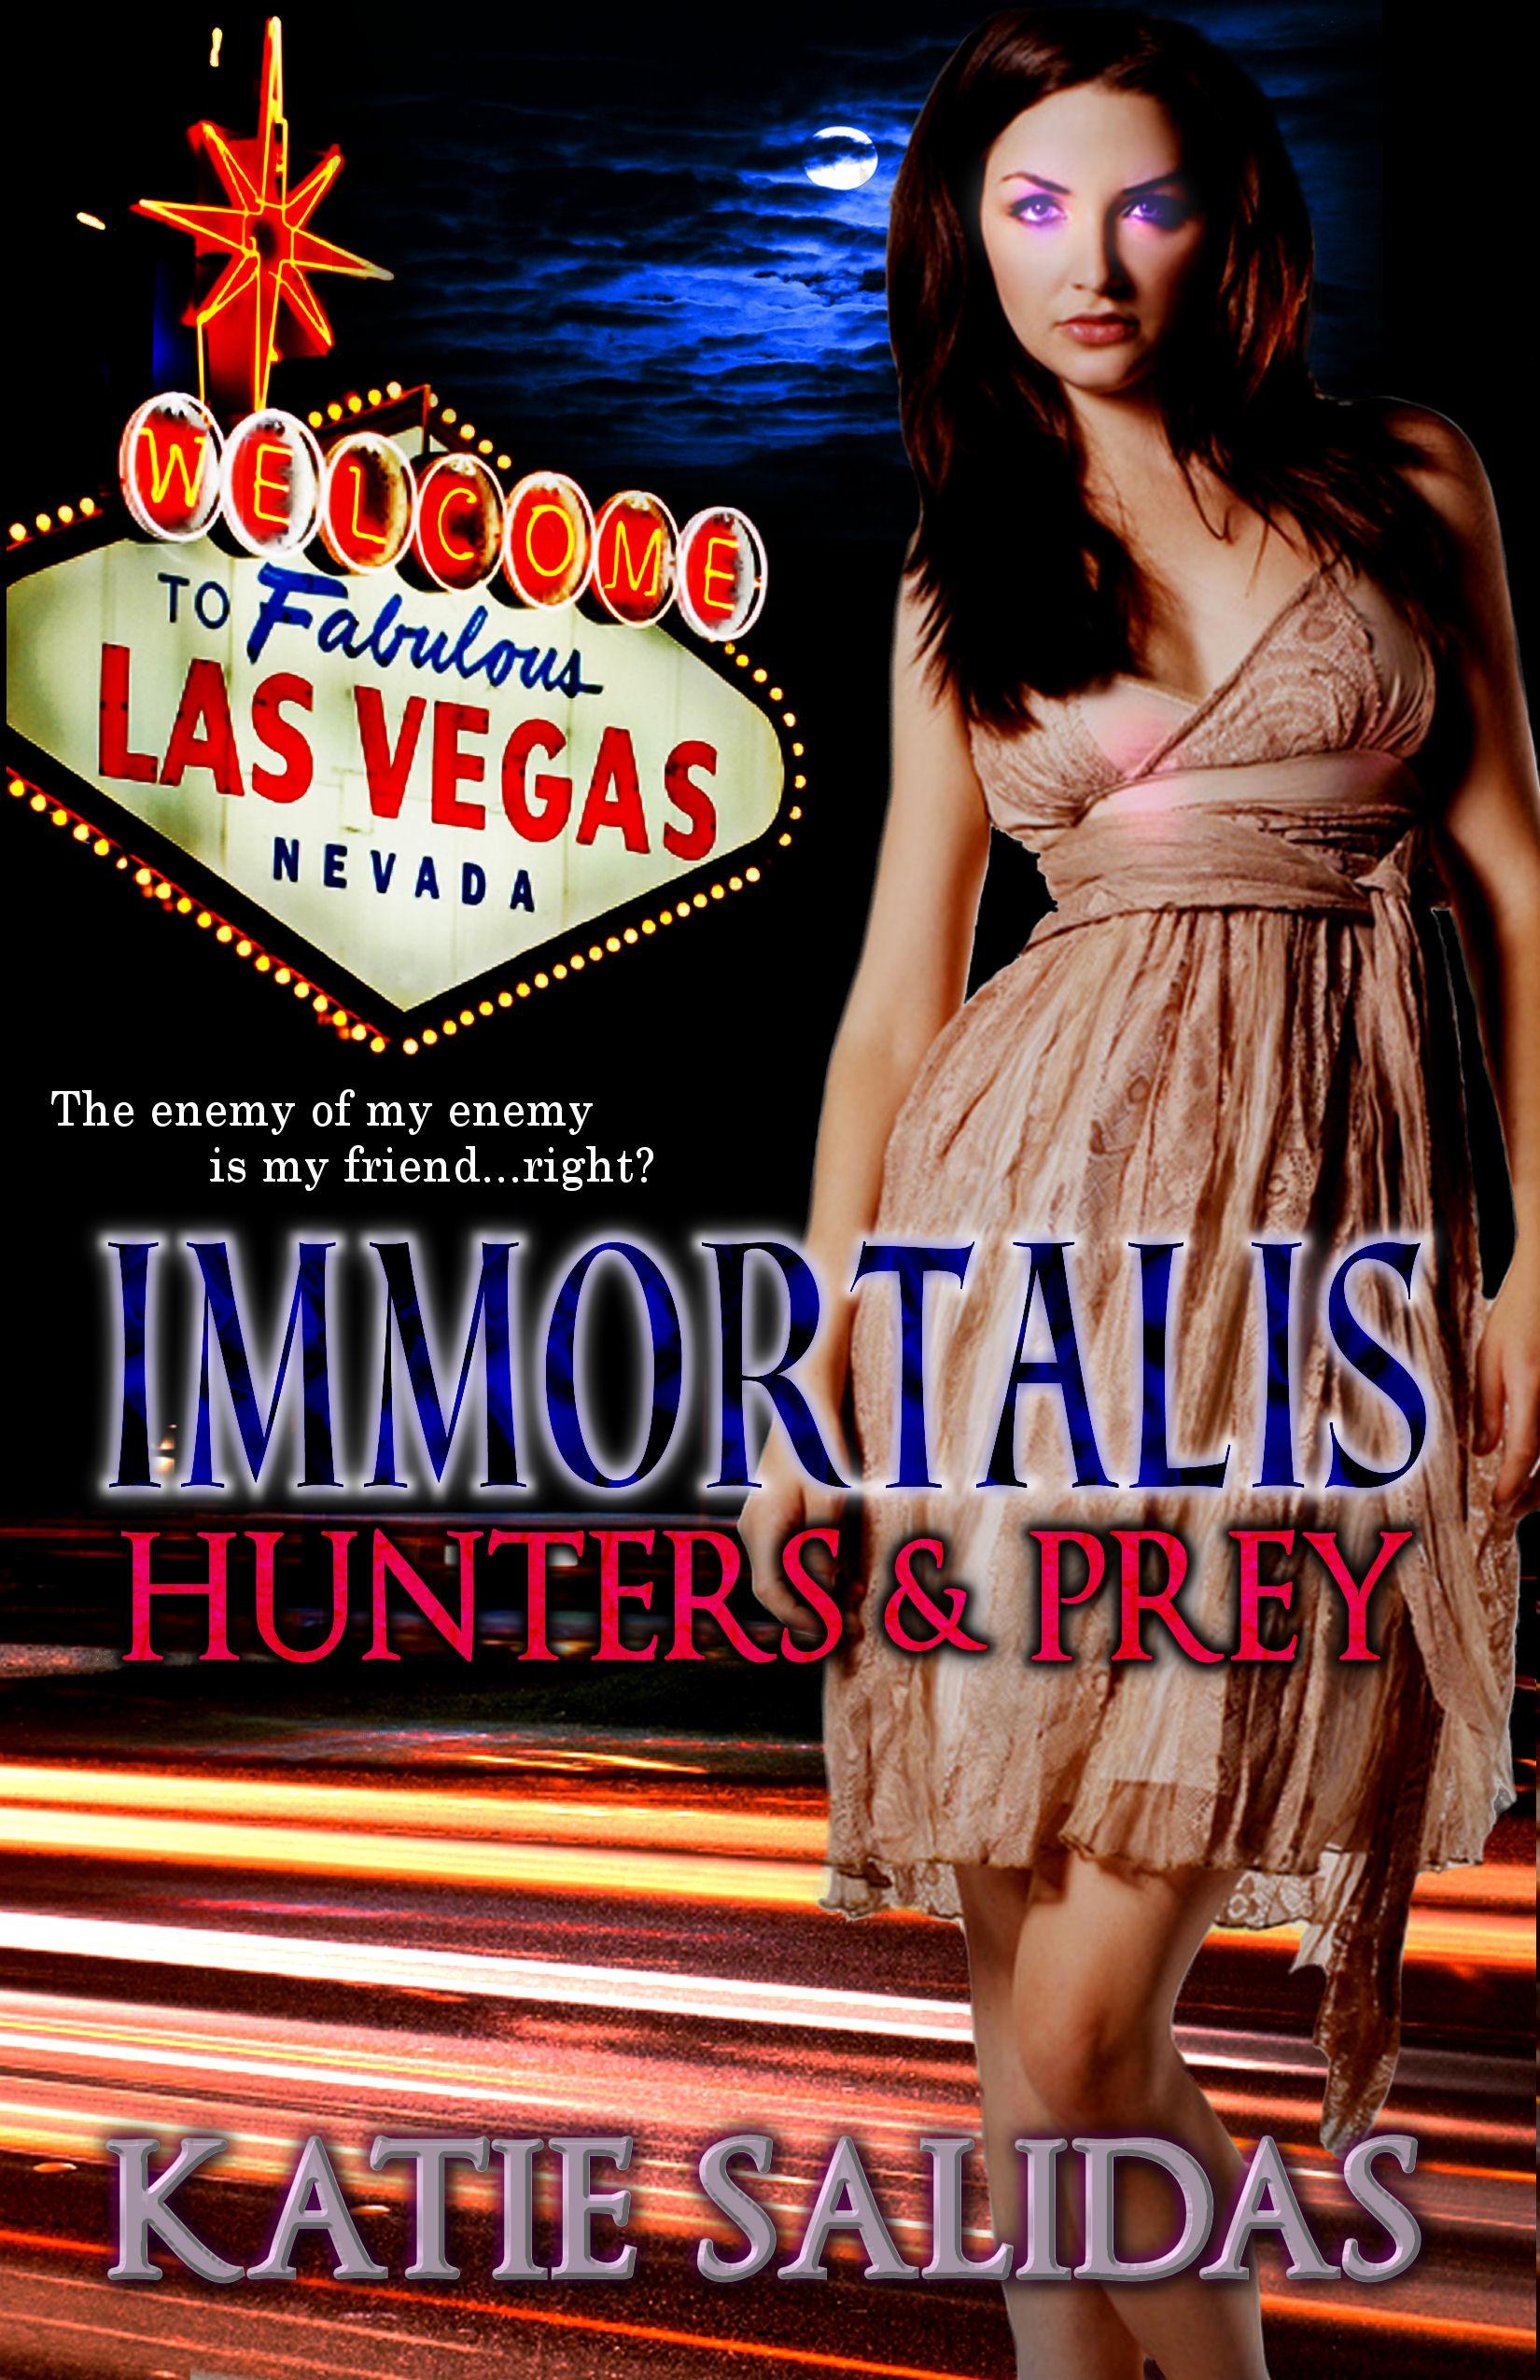 Immortalis: Hunters & Prey